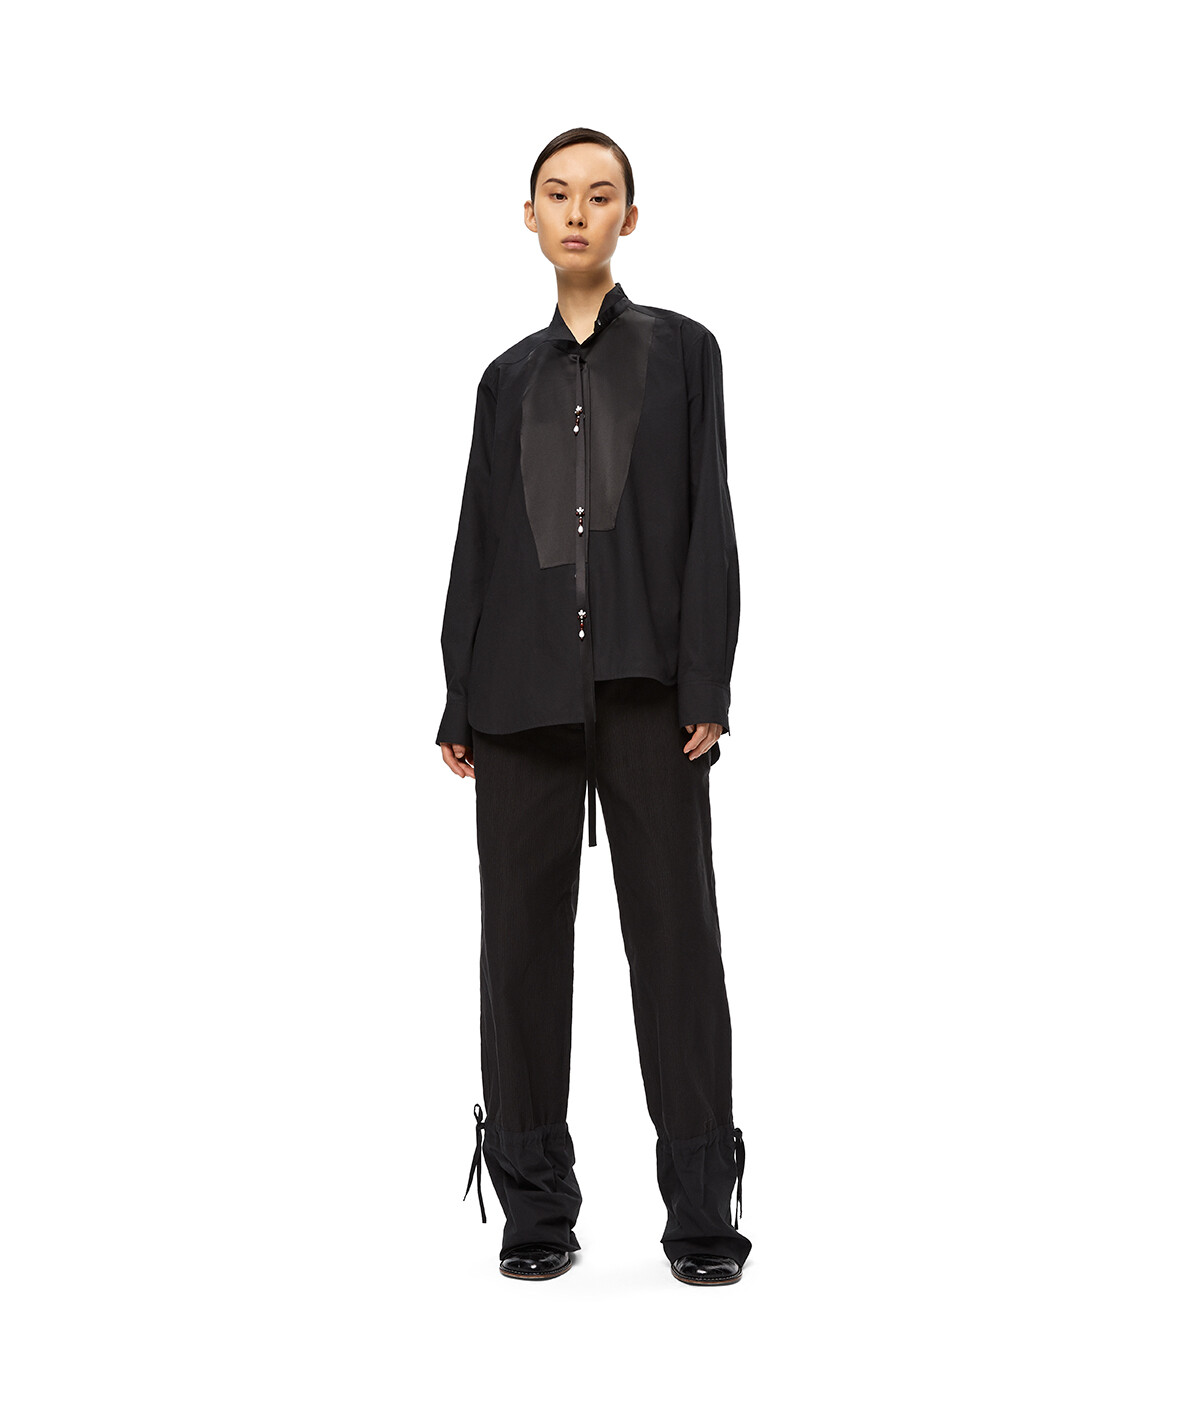 LOEWE Asym Ov Shirt Pearls Negro front